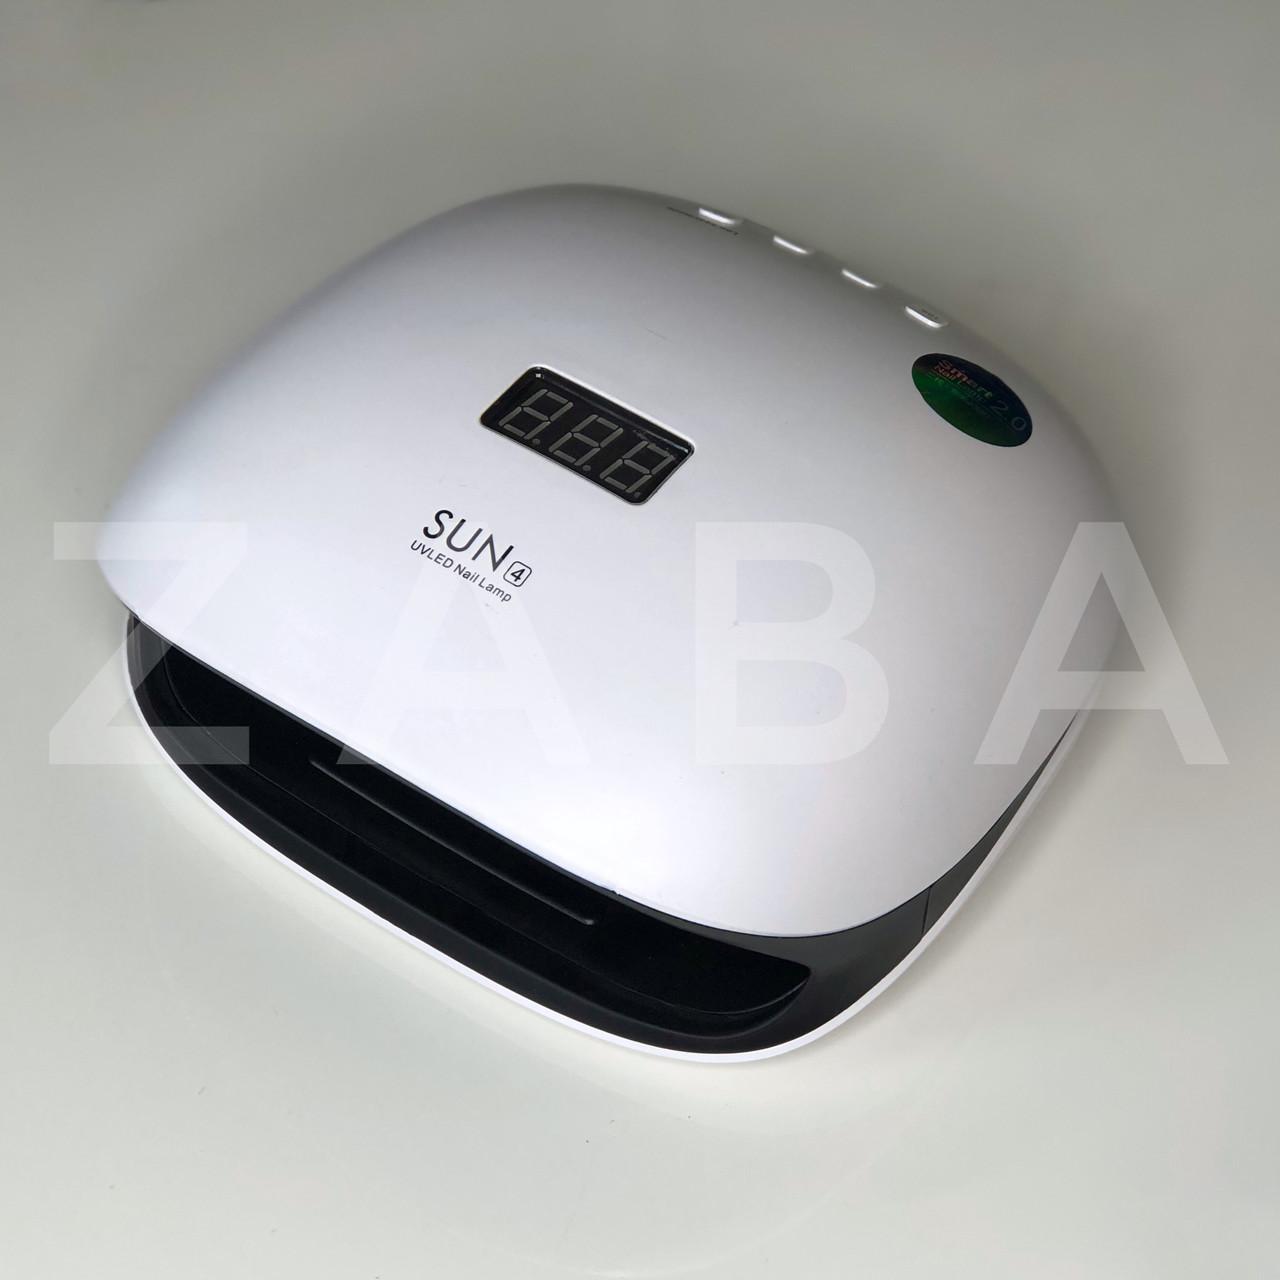 Лампа UV+LED SUNUV SUN 4 2.0 на 48 Вт для сушки геля и гель лака